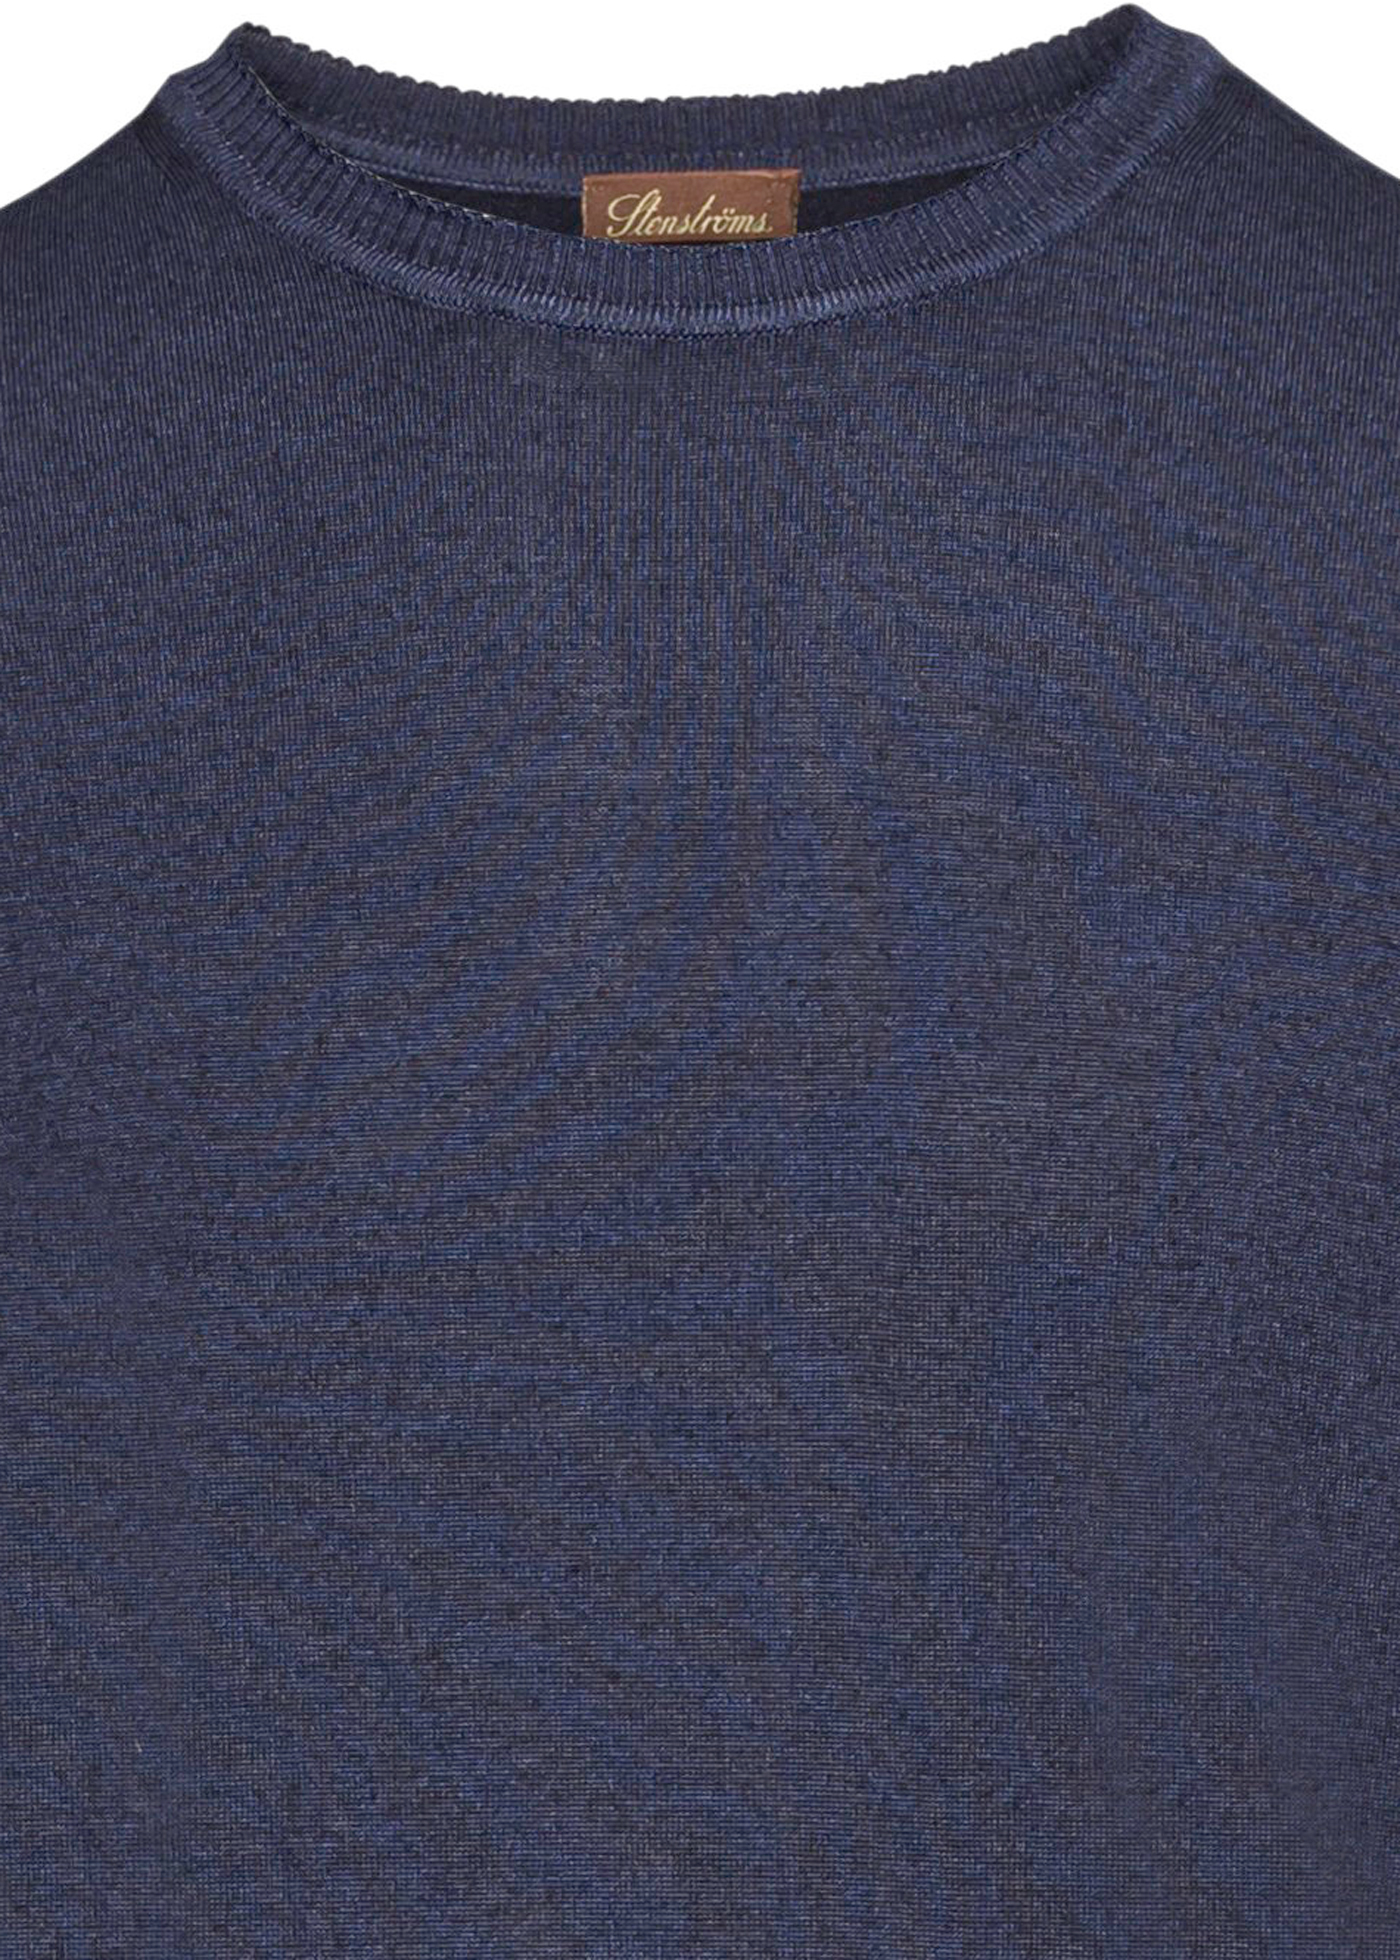 Garm Dyed Merino Crew image number 2